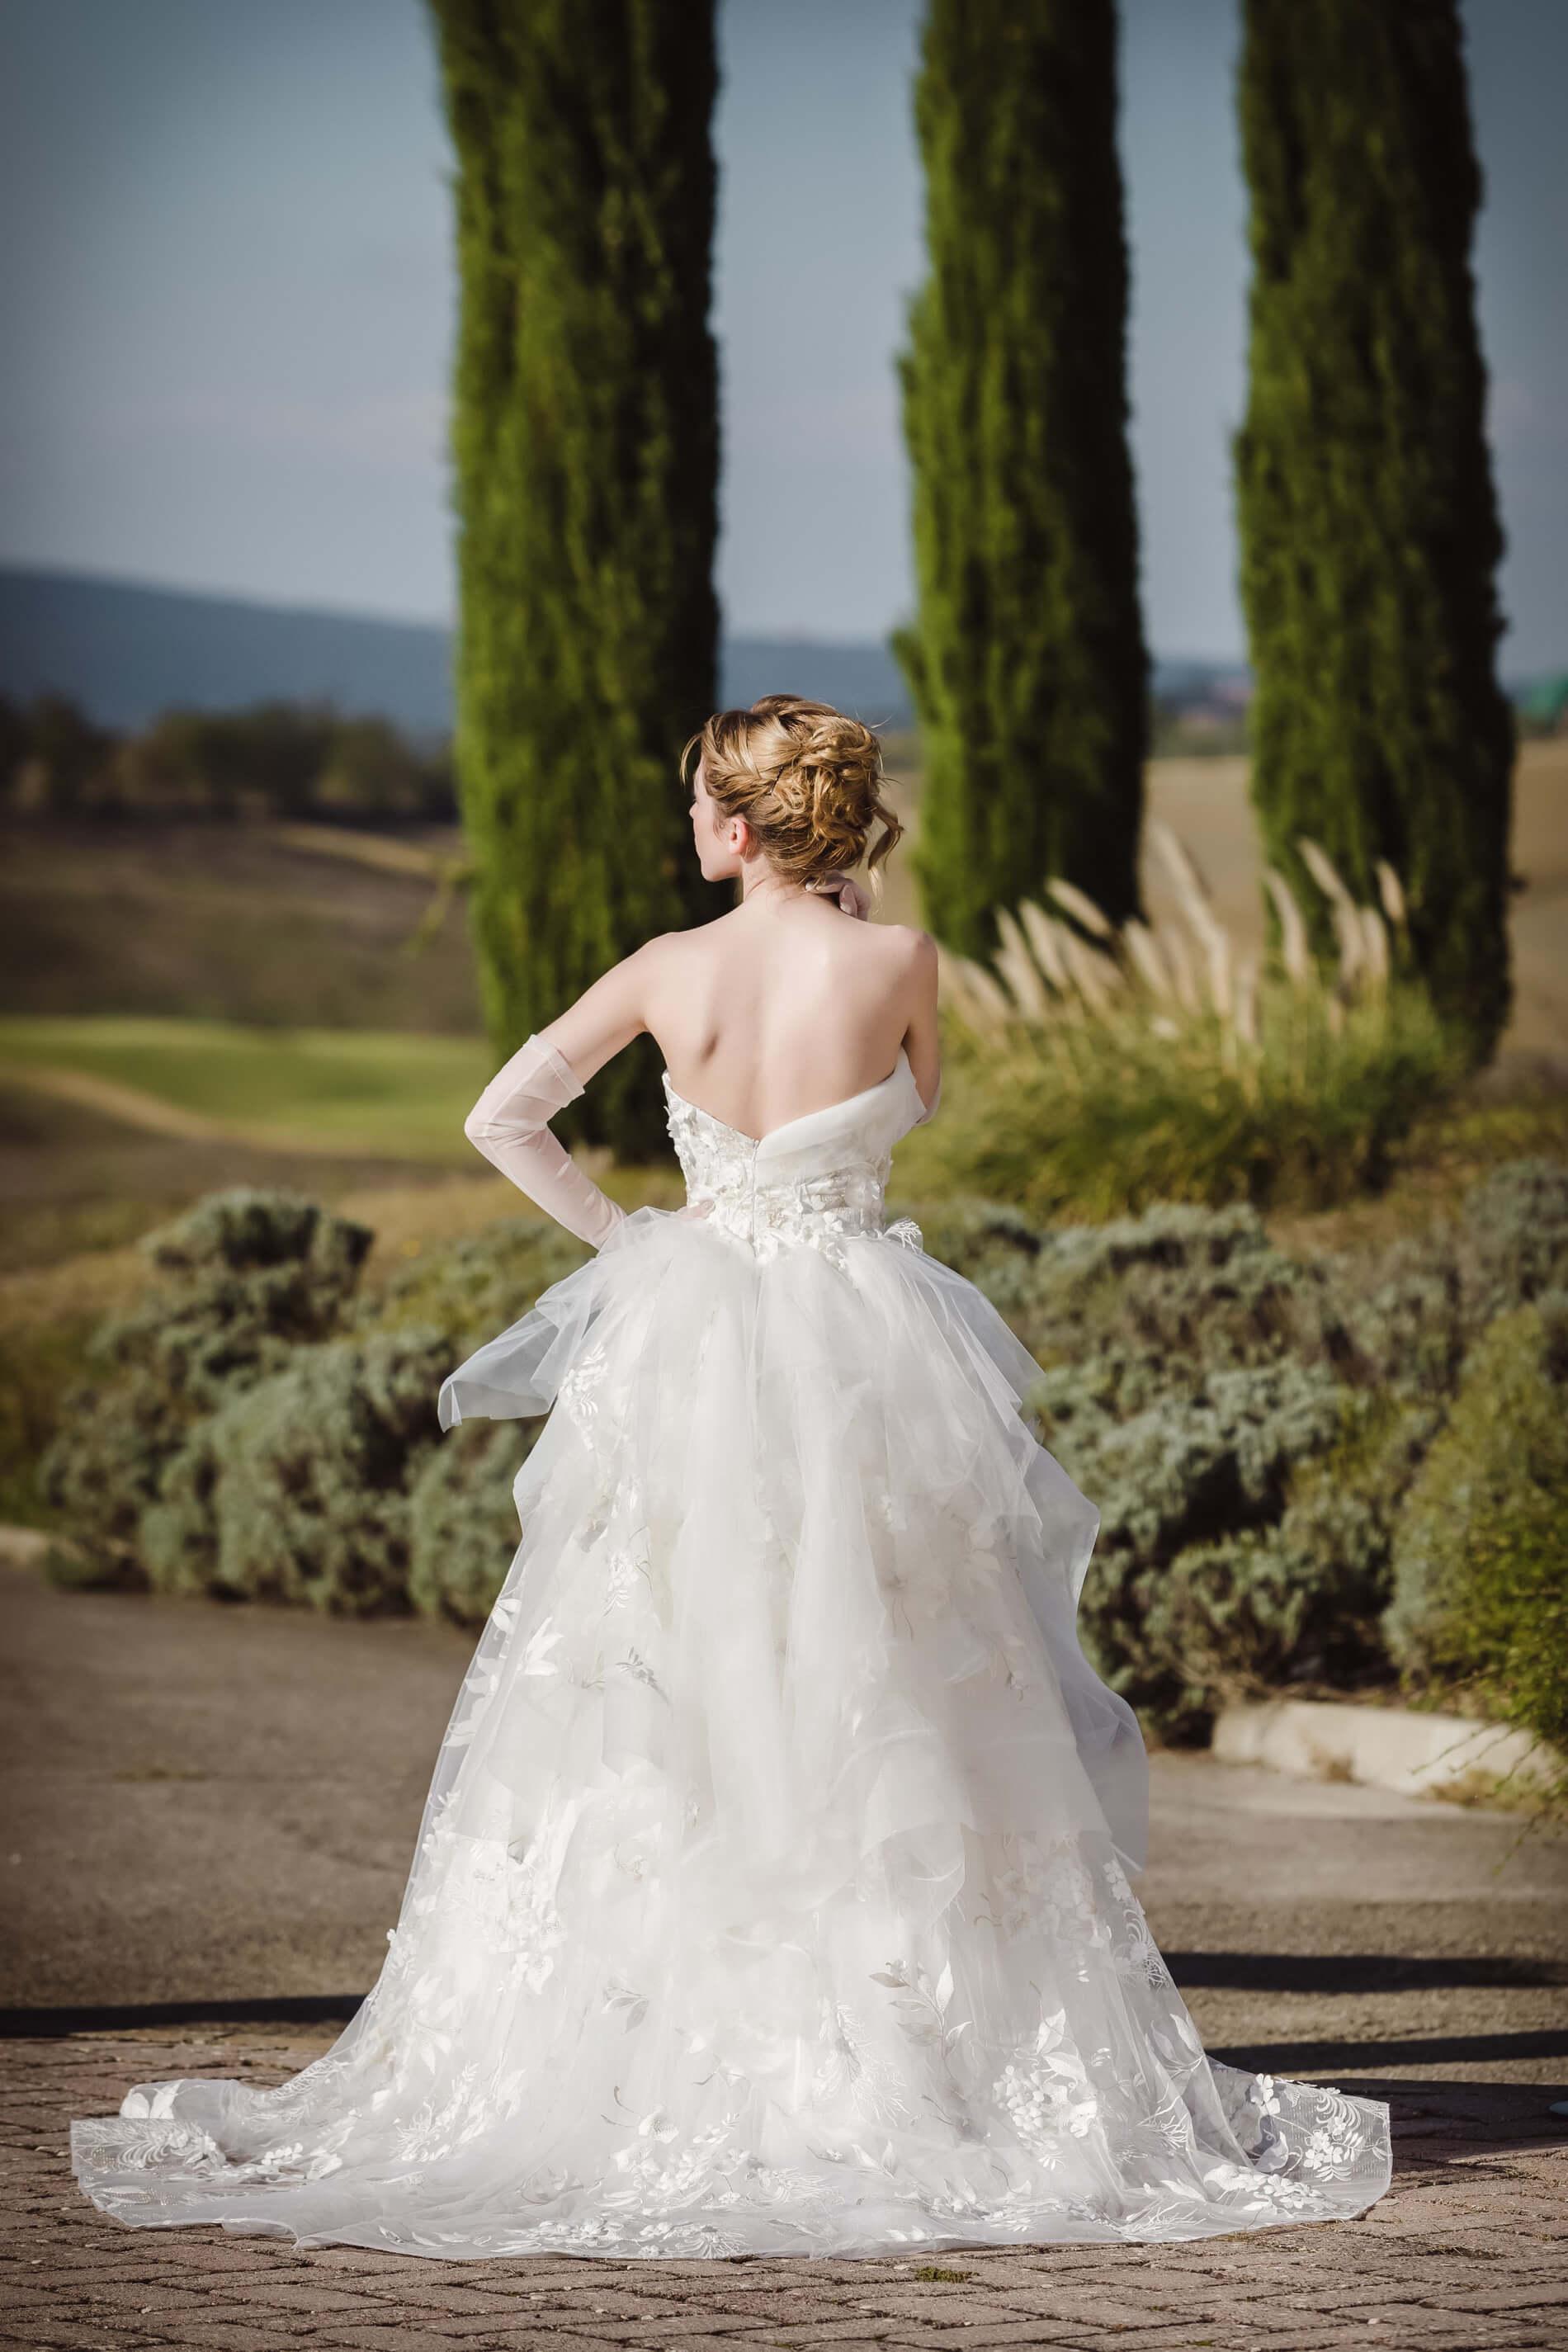 Margherita 2 - Zea Couture - Abiti da Sposa